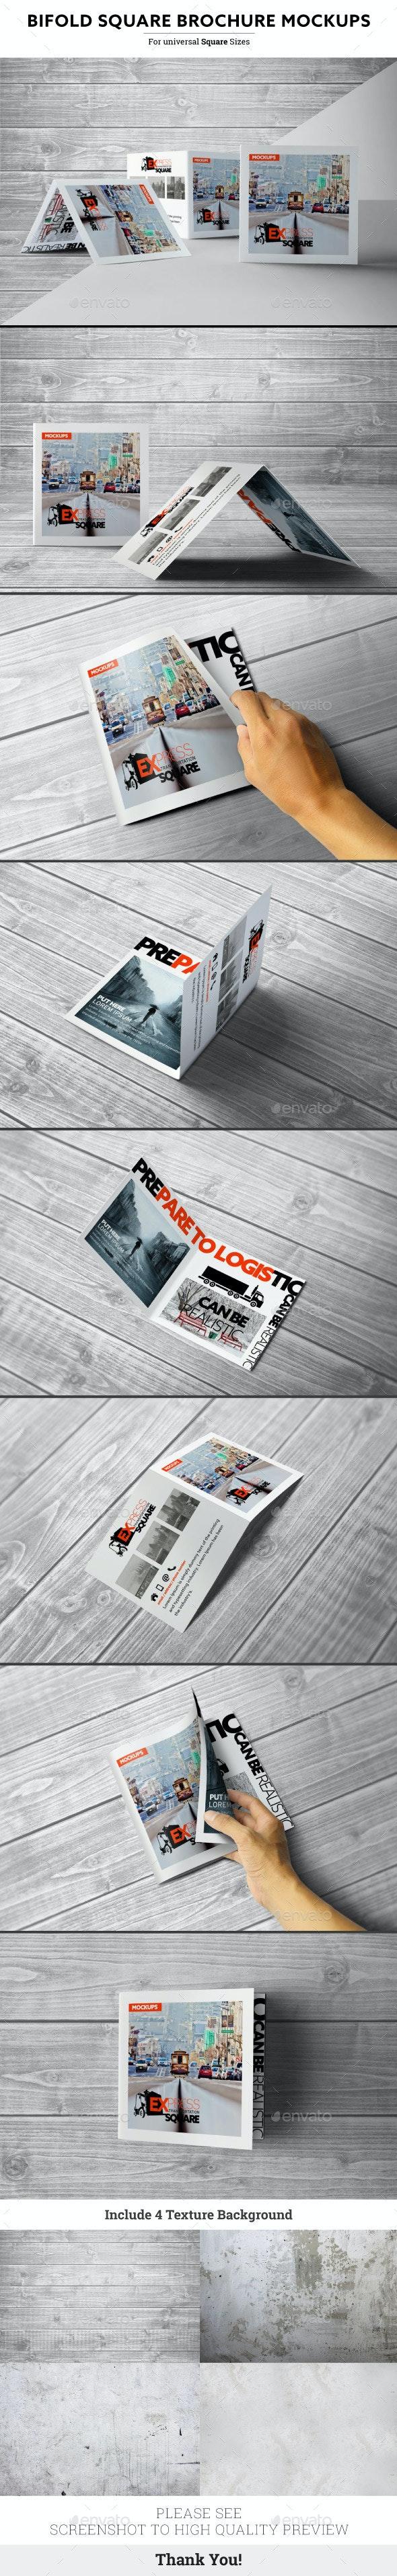 Bifold Square Brochure Mockups - Product Mock-Ups Graphics